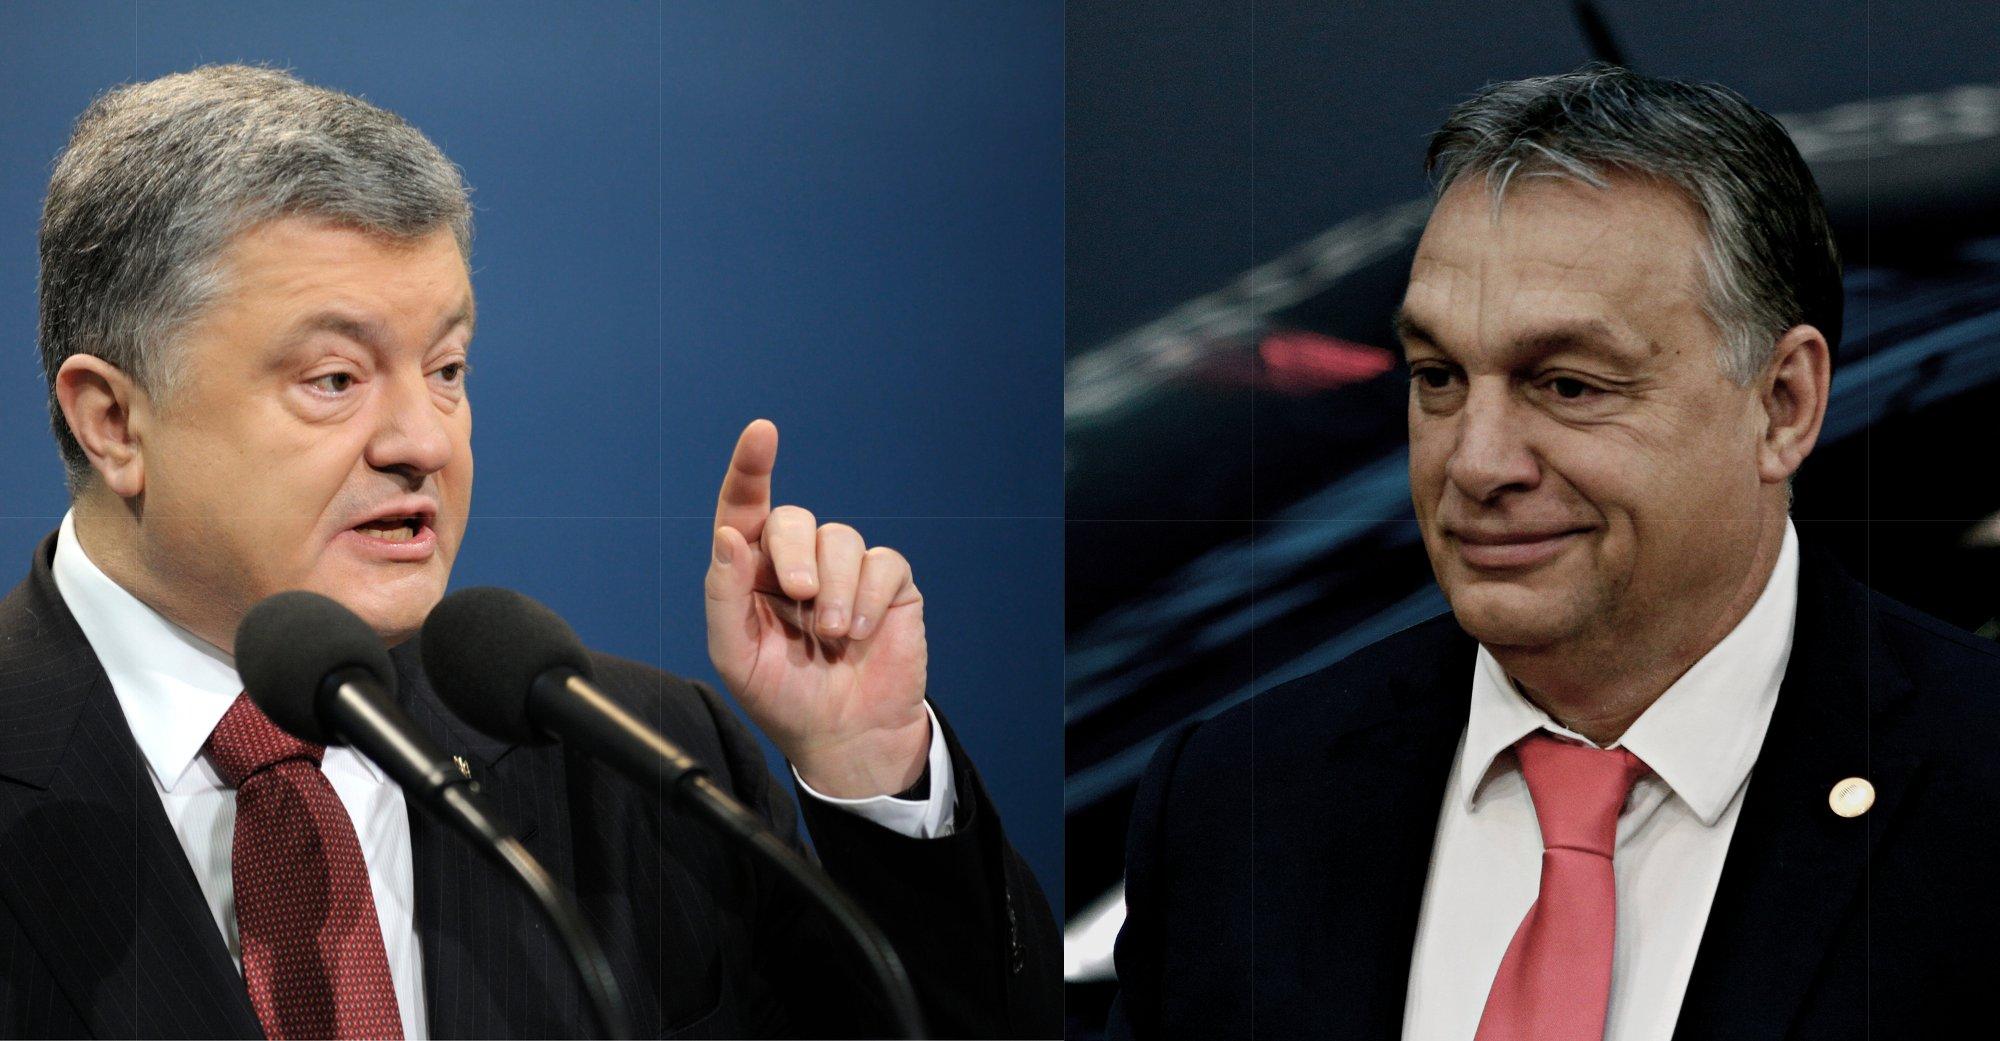 Petro Poroshenko (foto di Krysja/Shutterstock) e Viktor Orban (foto di Alexandros Michailidis/Shutterstock)